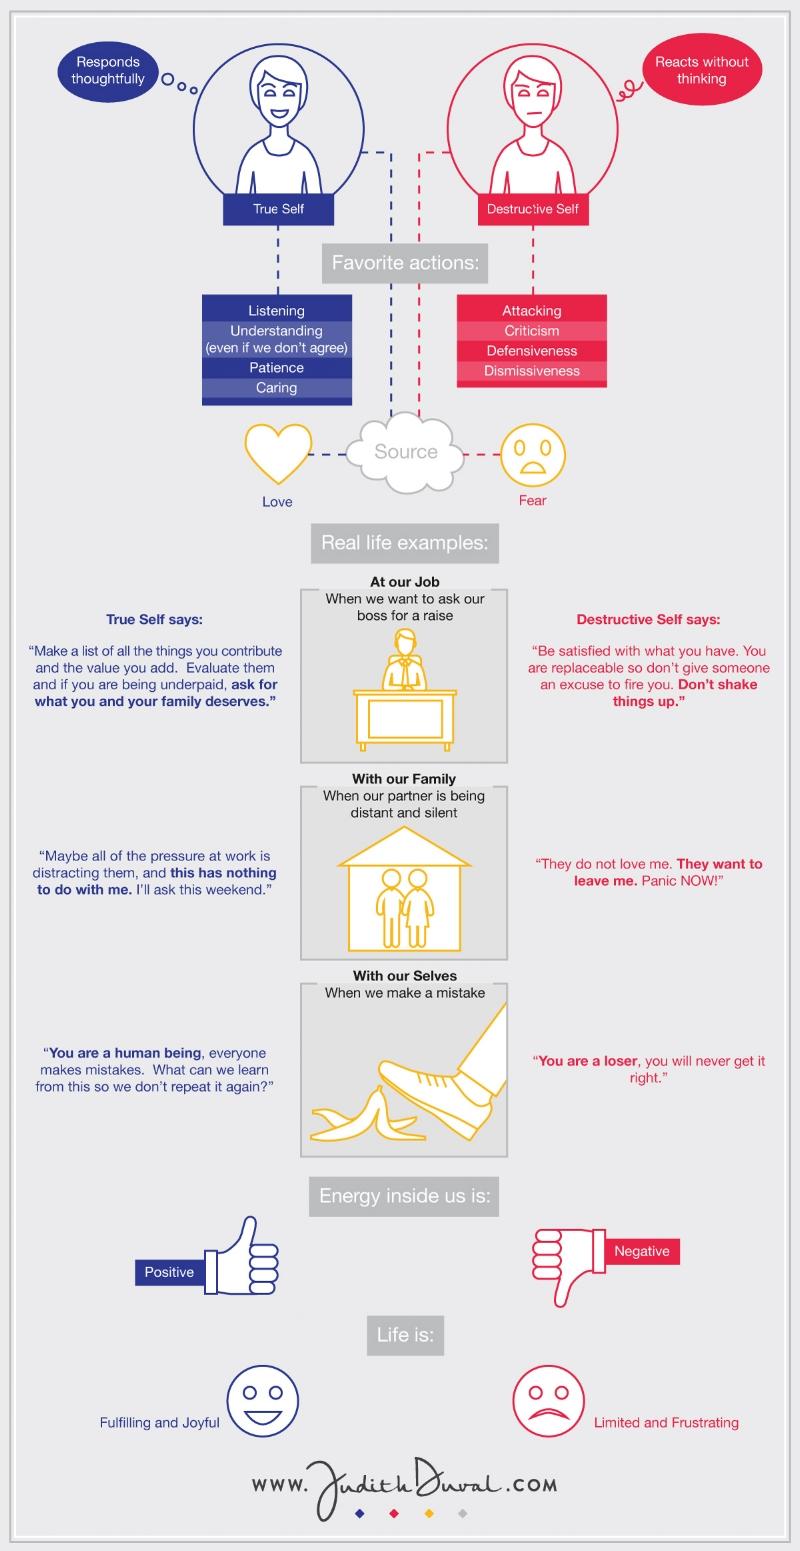 True vs. Destructive infographics_20_12_1.jpg